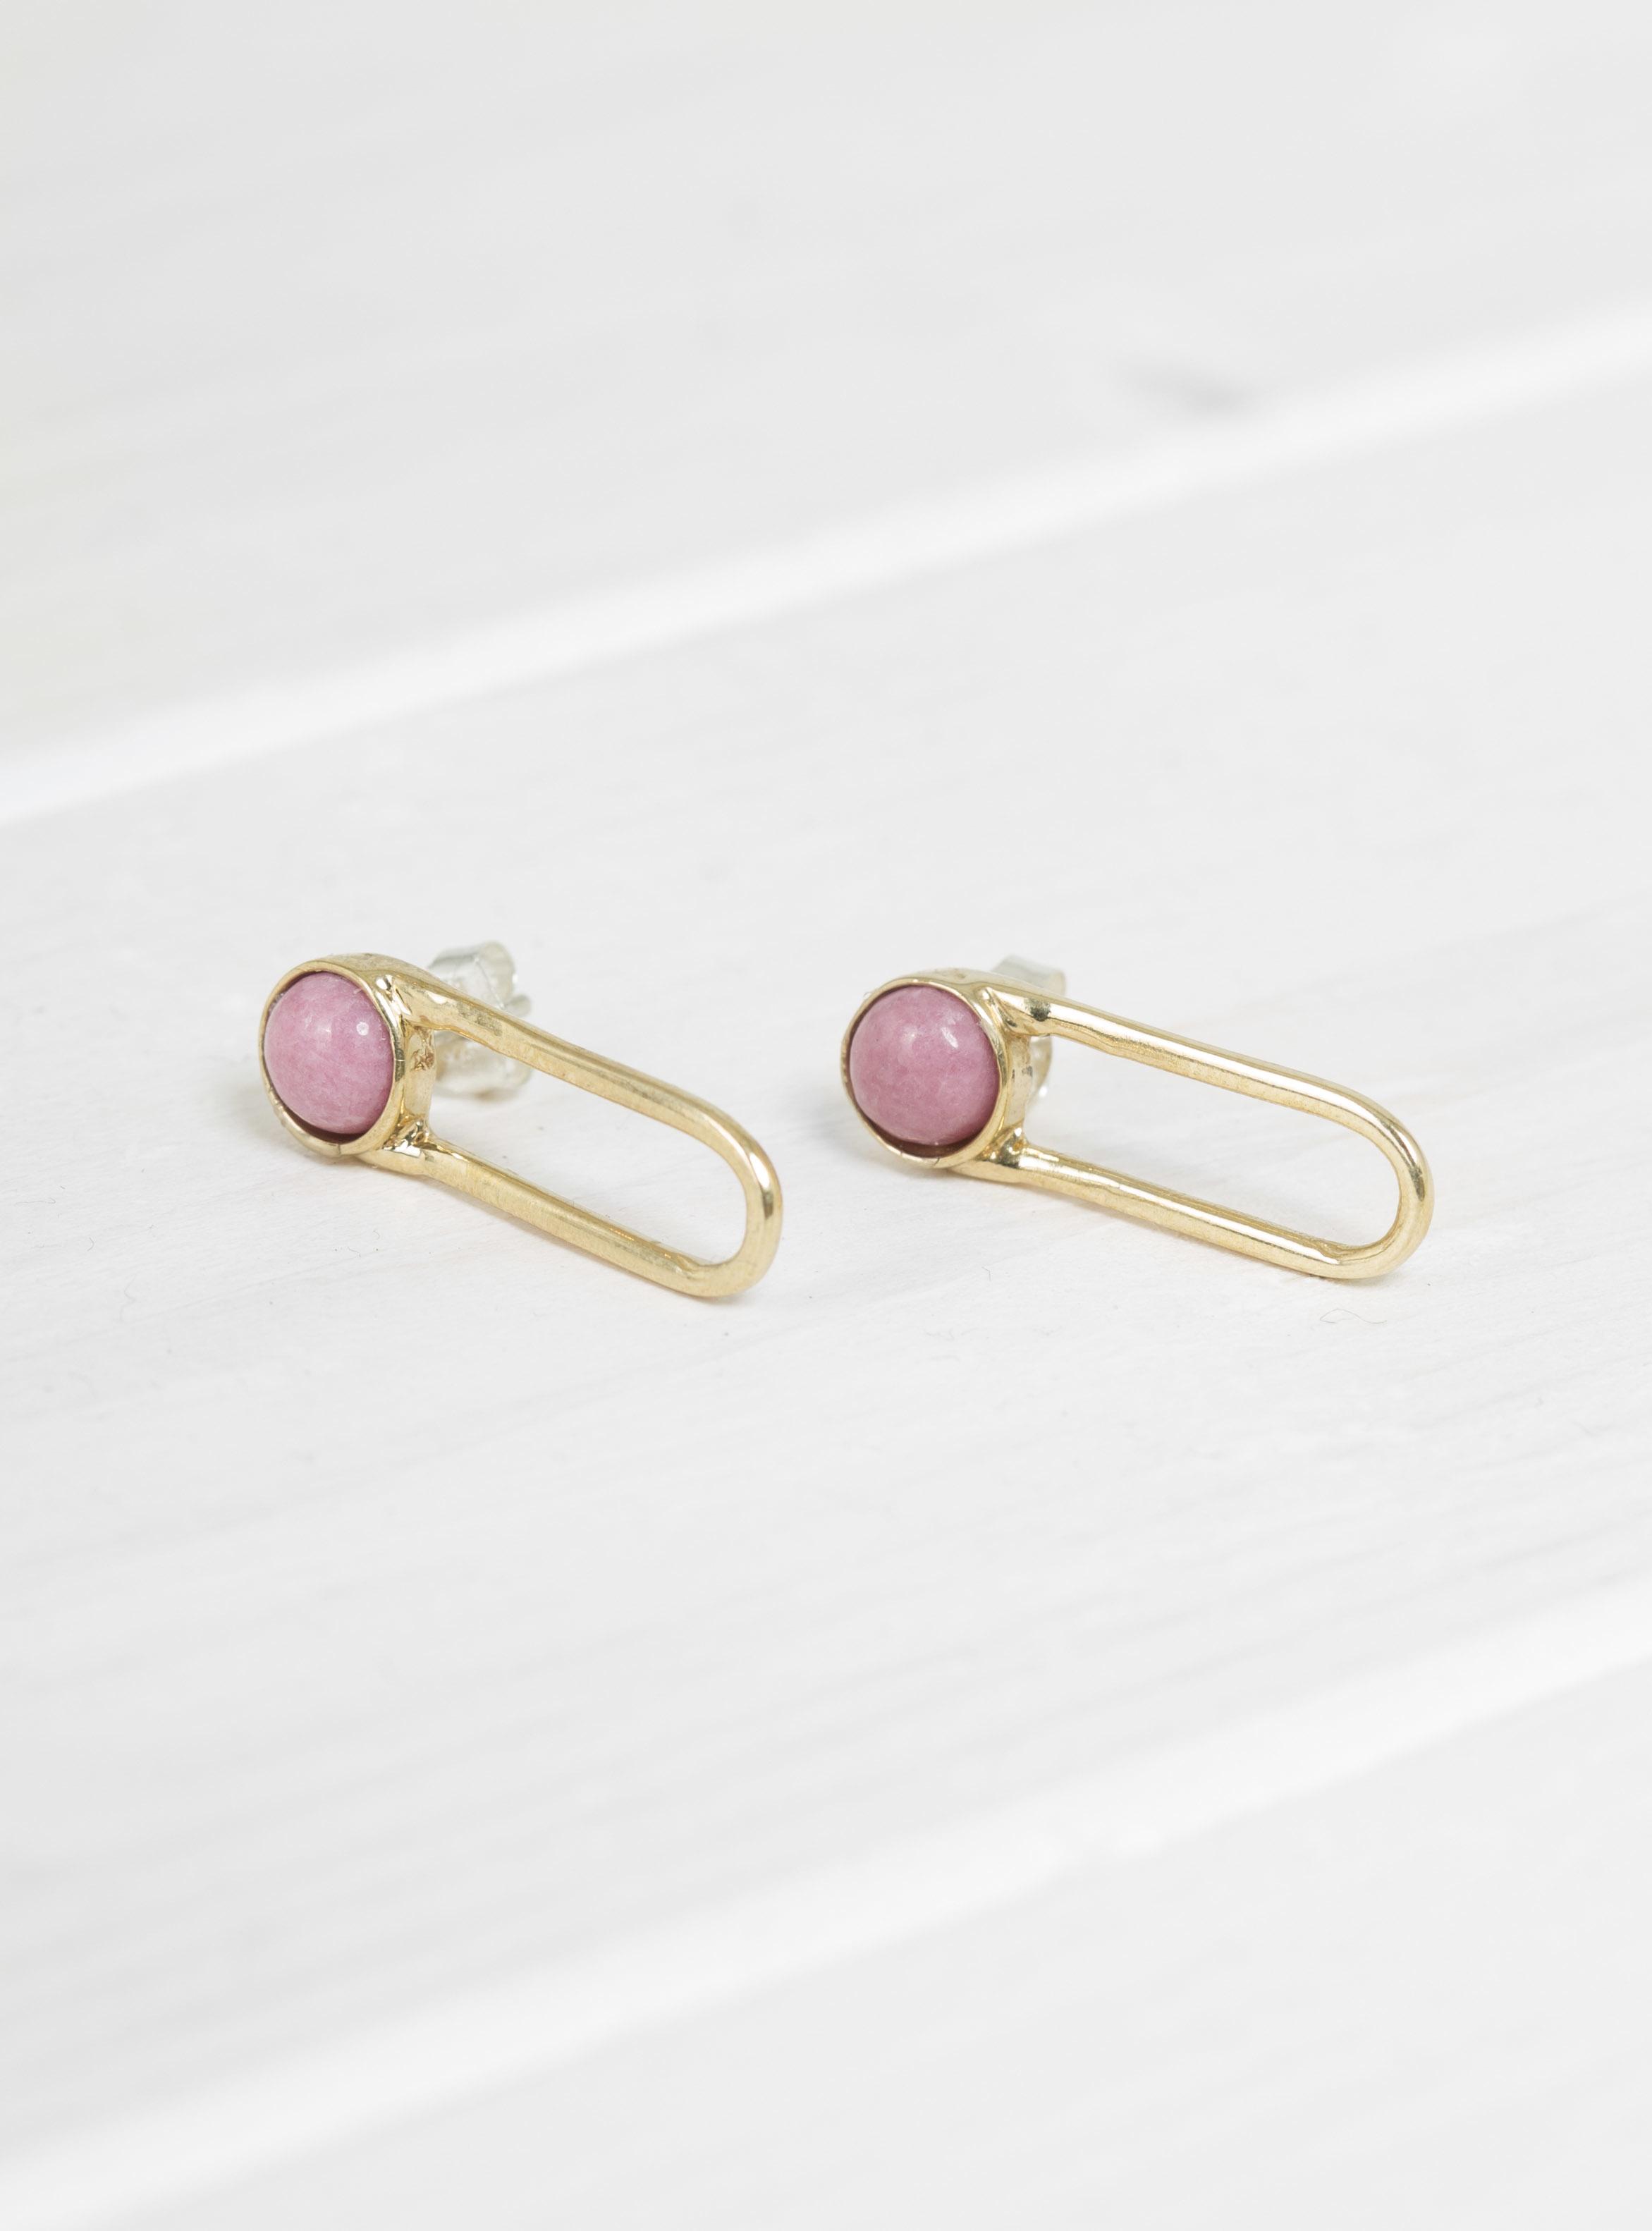 Nd Hand Diamond Stud Earrings